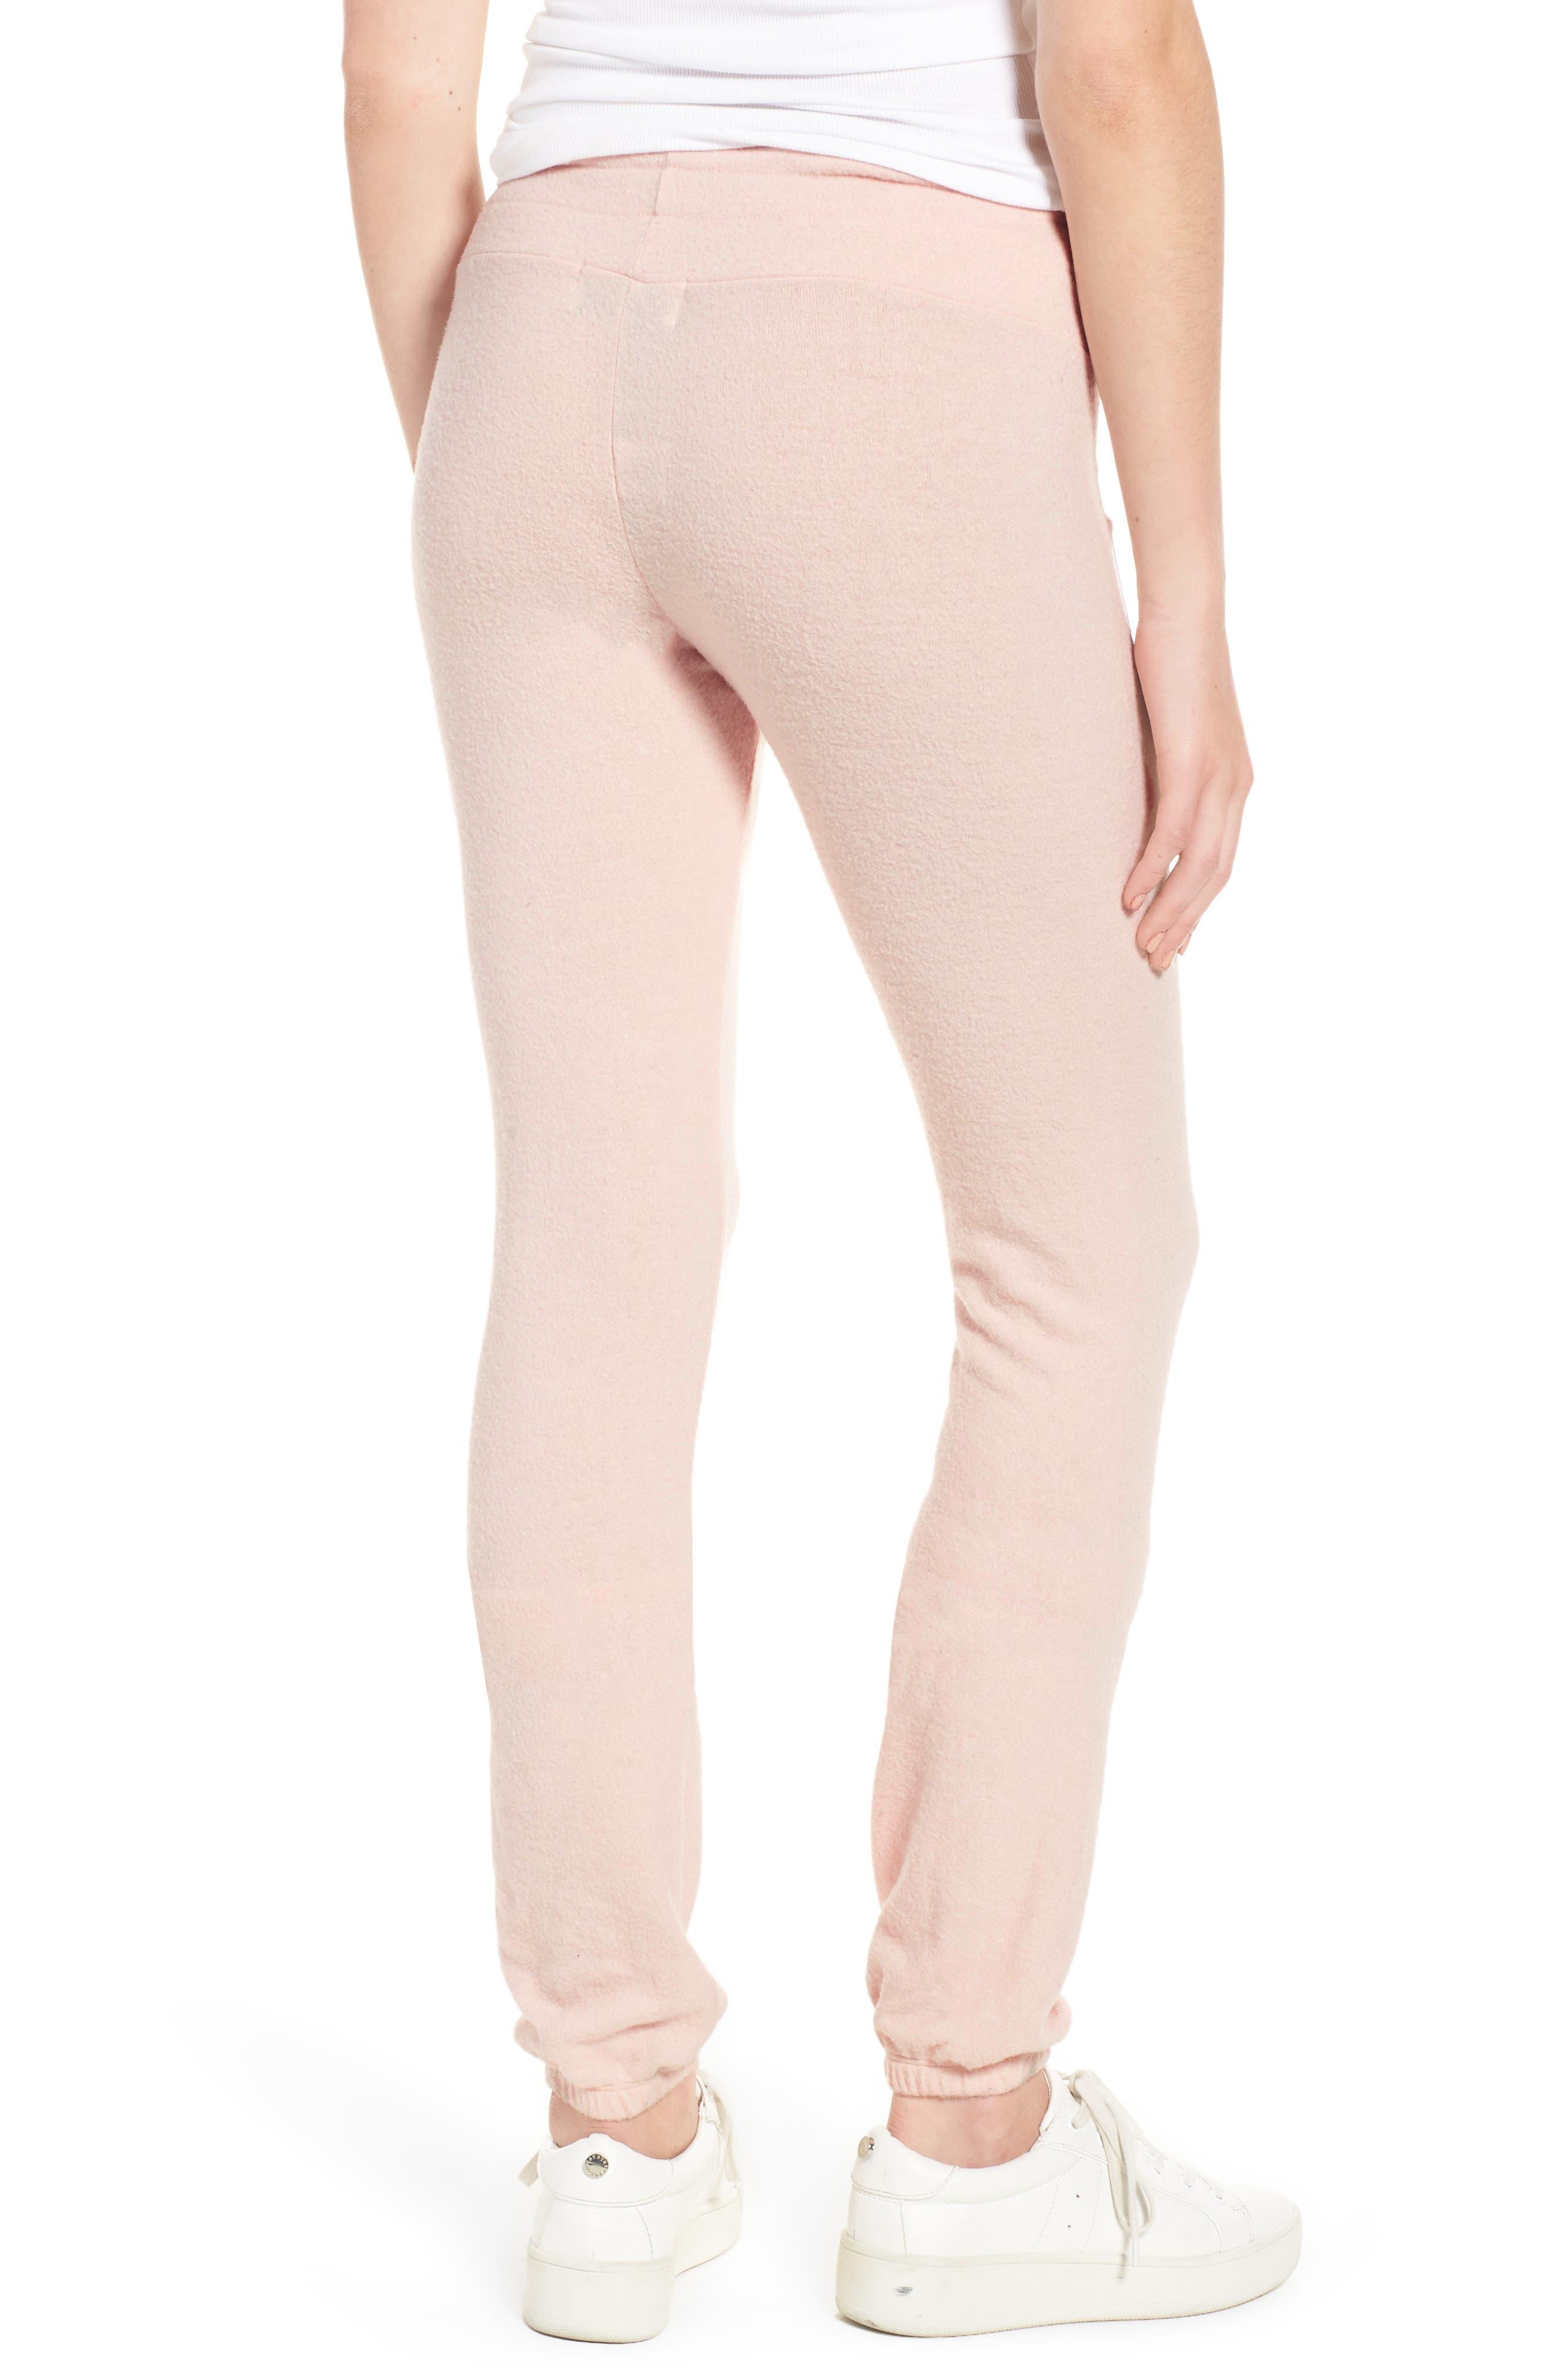 Rosé All Day Skinny Pants,                             Alternate thumbnail 2, color,                             650